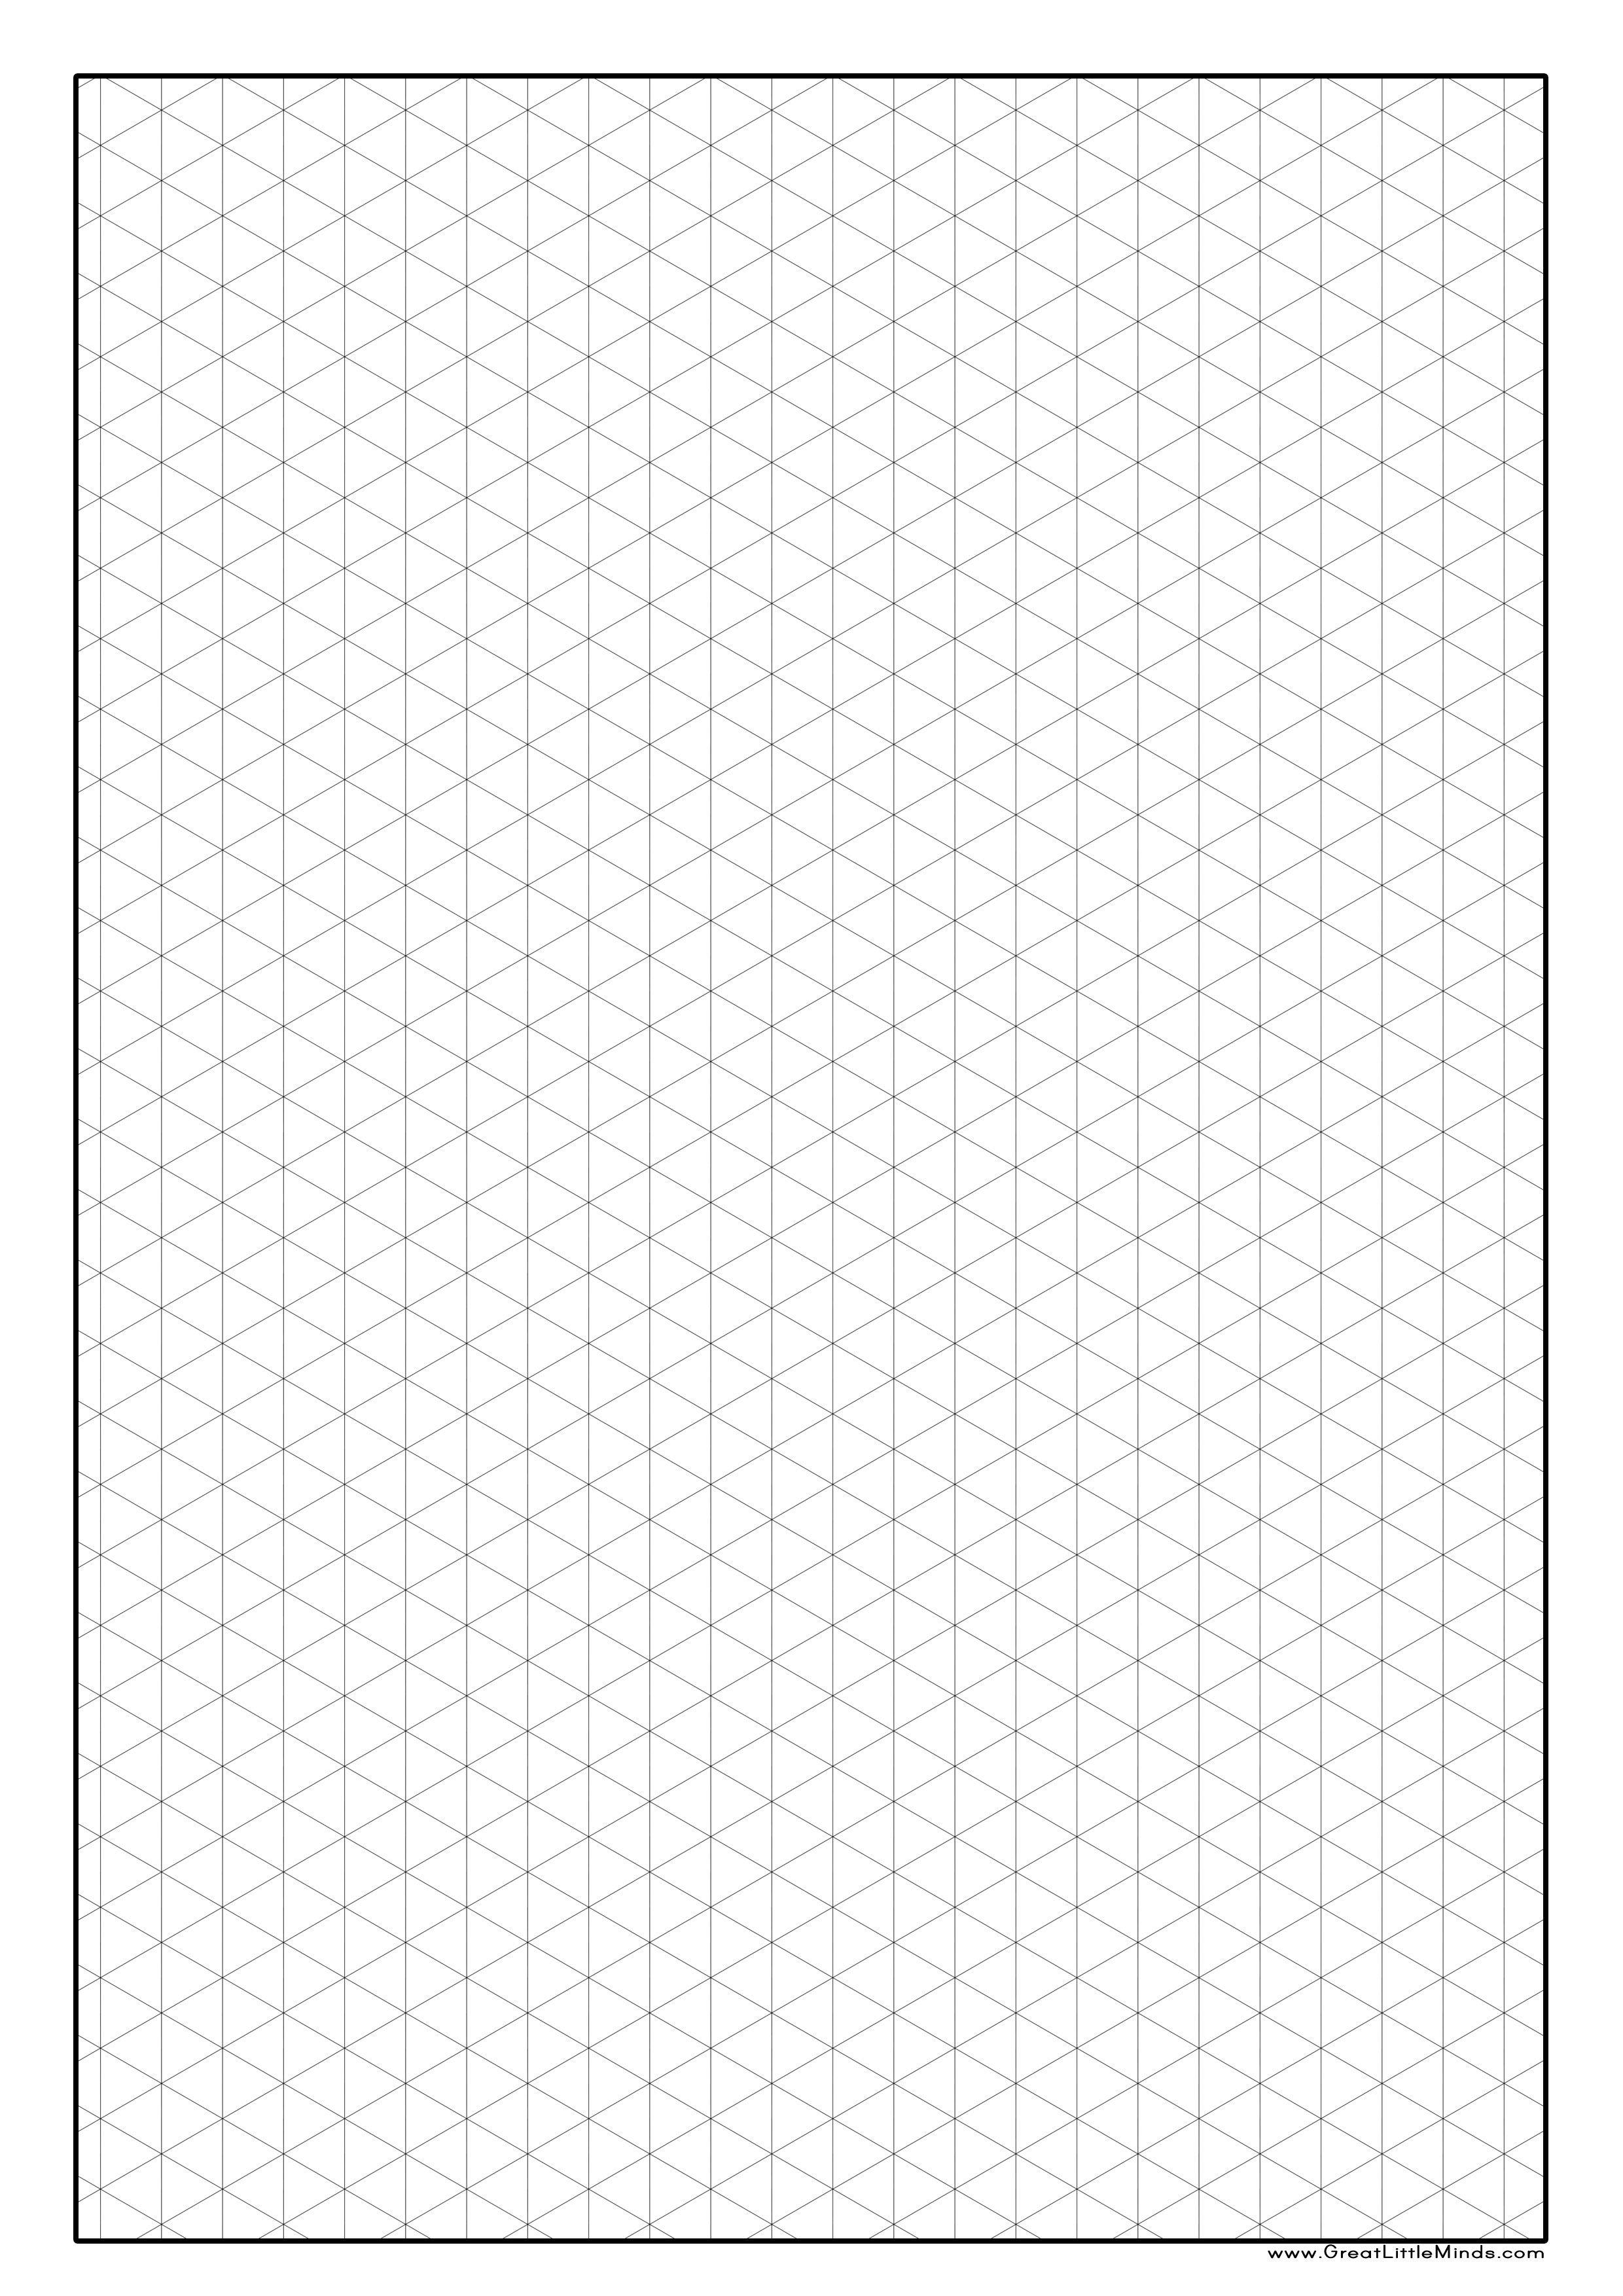 Printable Isometric Graph Paper Isometric Paper Isometric Grid Isometric Graph Paper